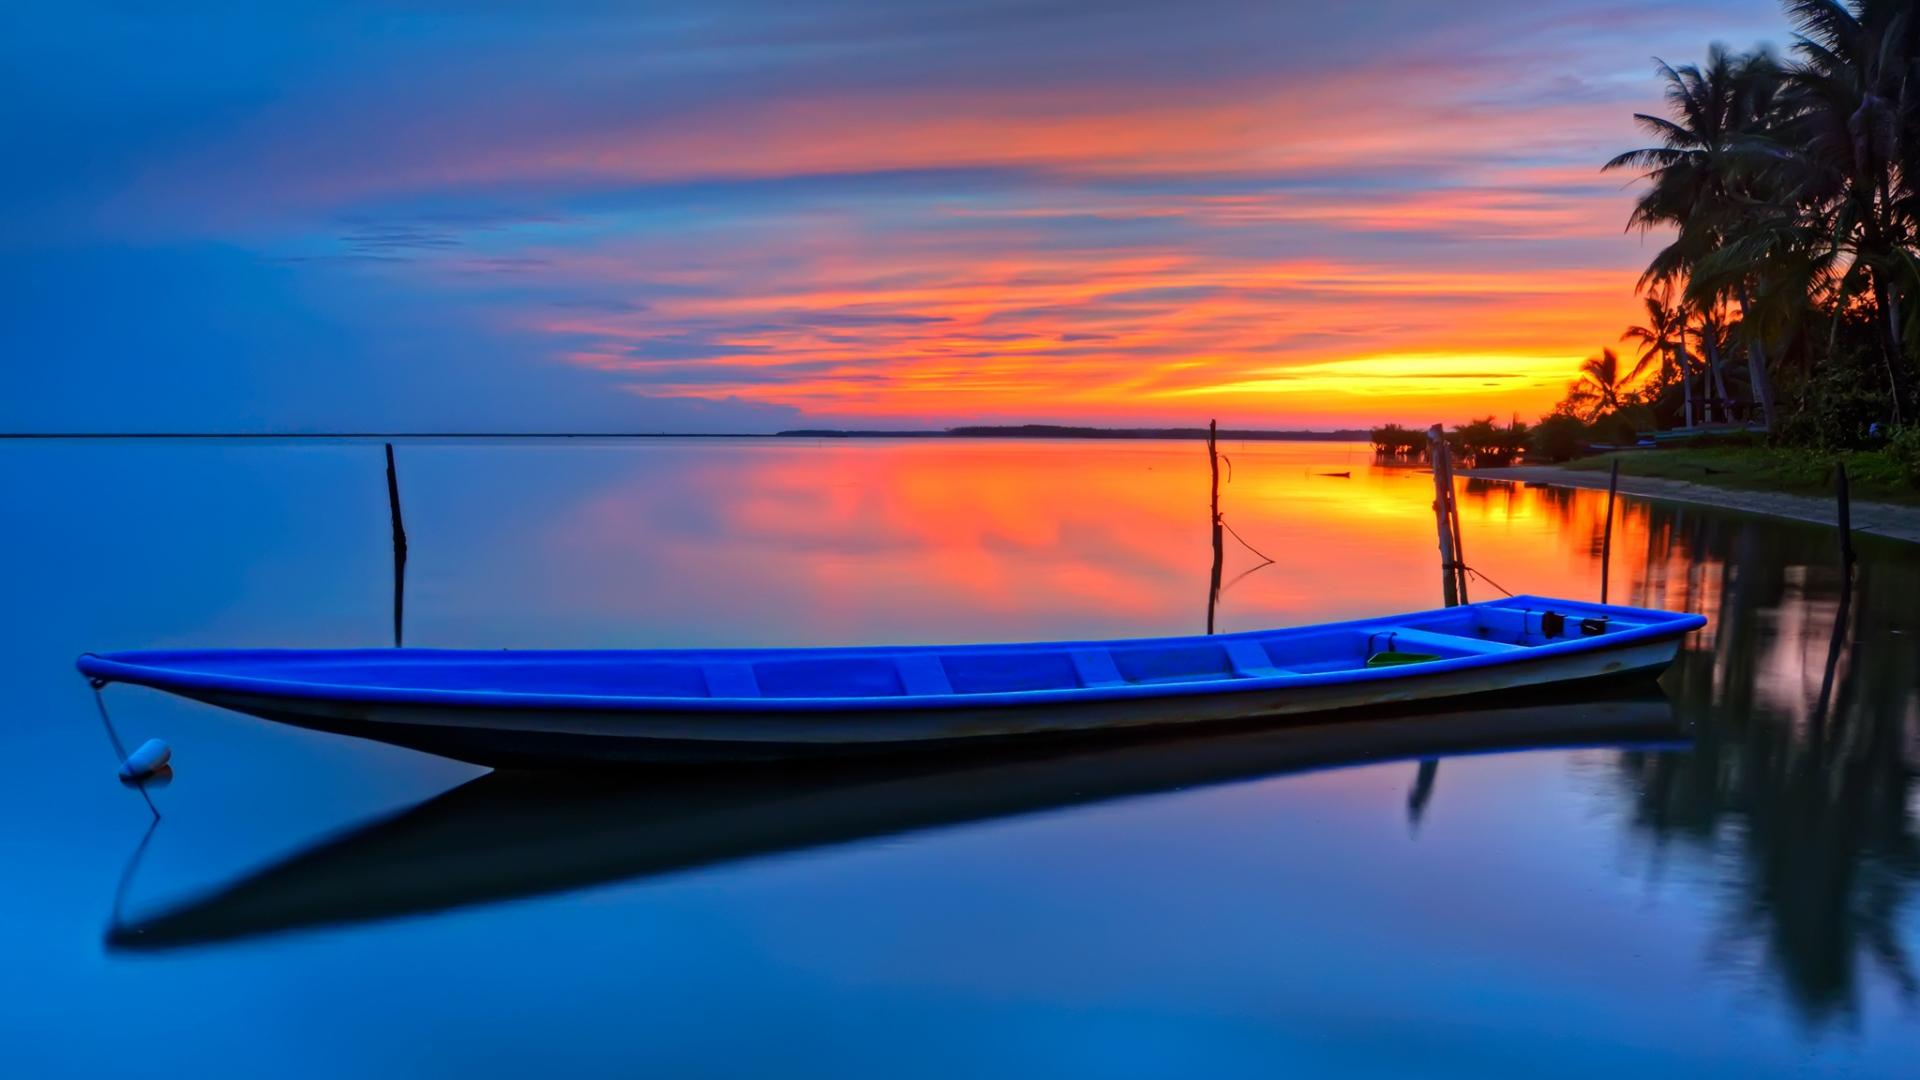 Boat At Sunset Fondo De Pantalla Hd Fondo De Escritorio